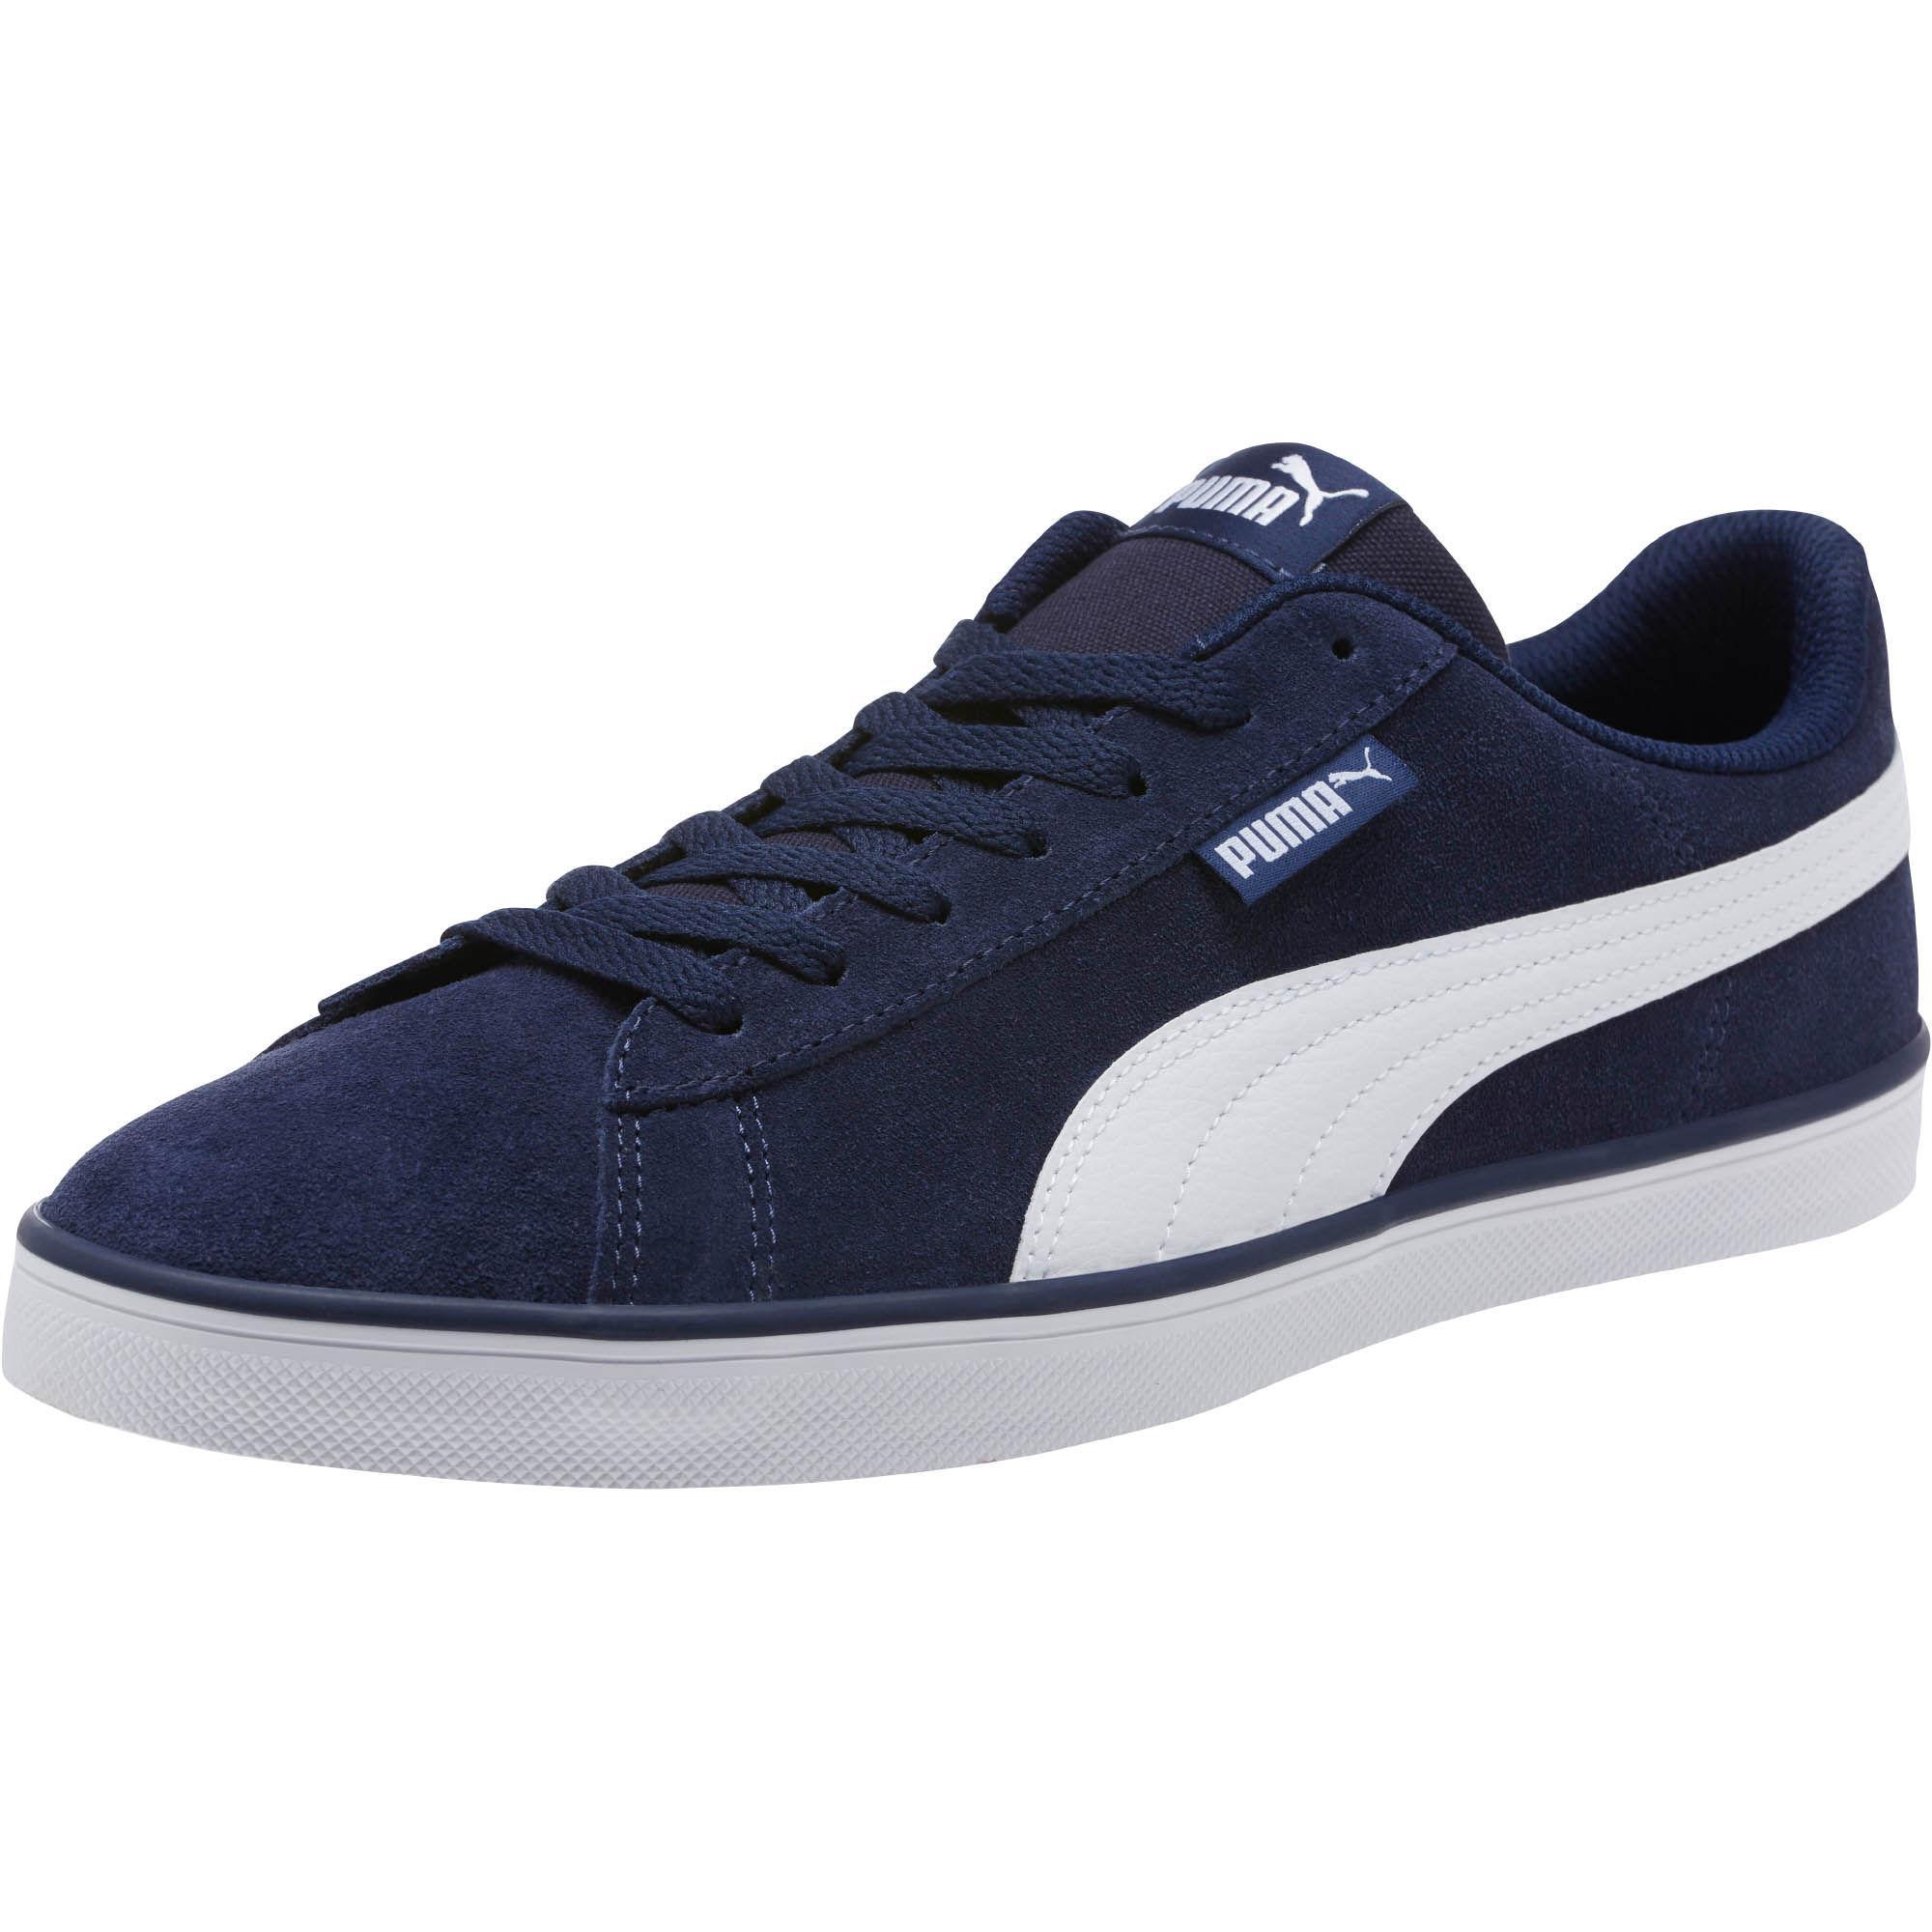 e54979c87c3ac7 Lyst - PUMA Urban Plus Suede Sneakers in Blue for Men - Save 36%